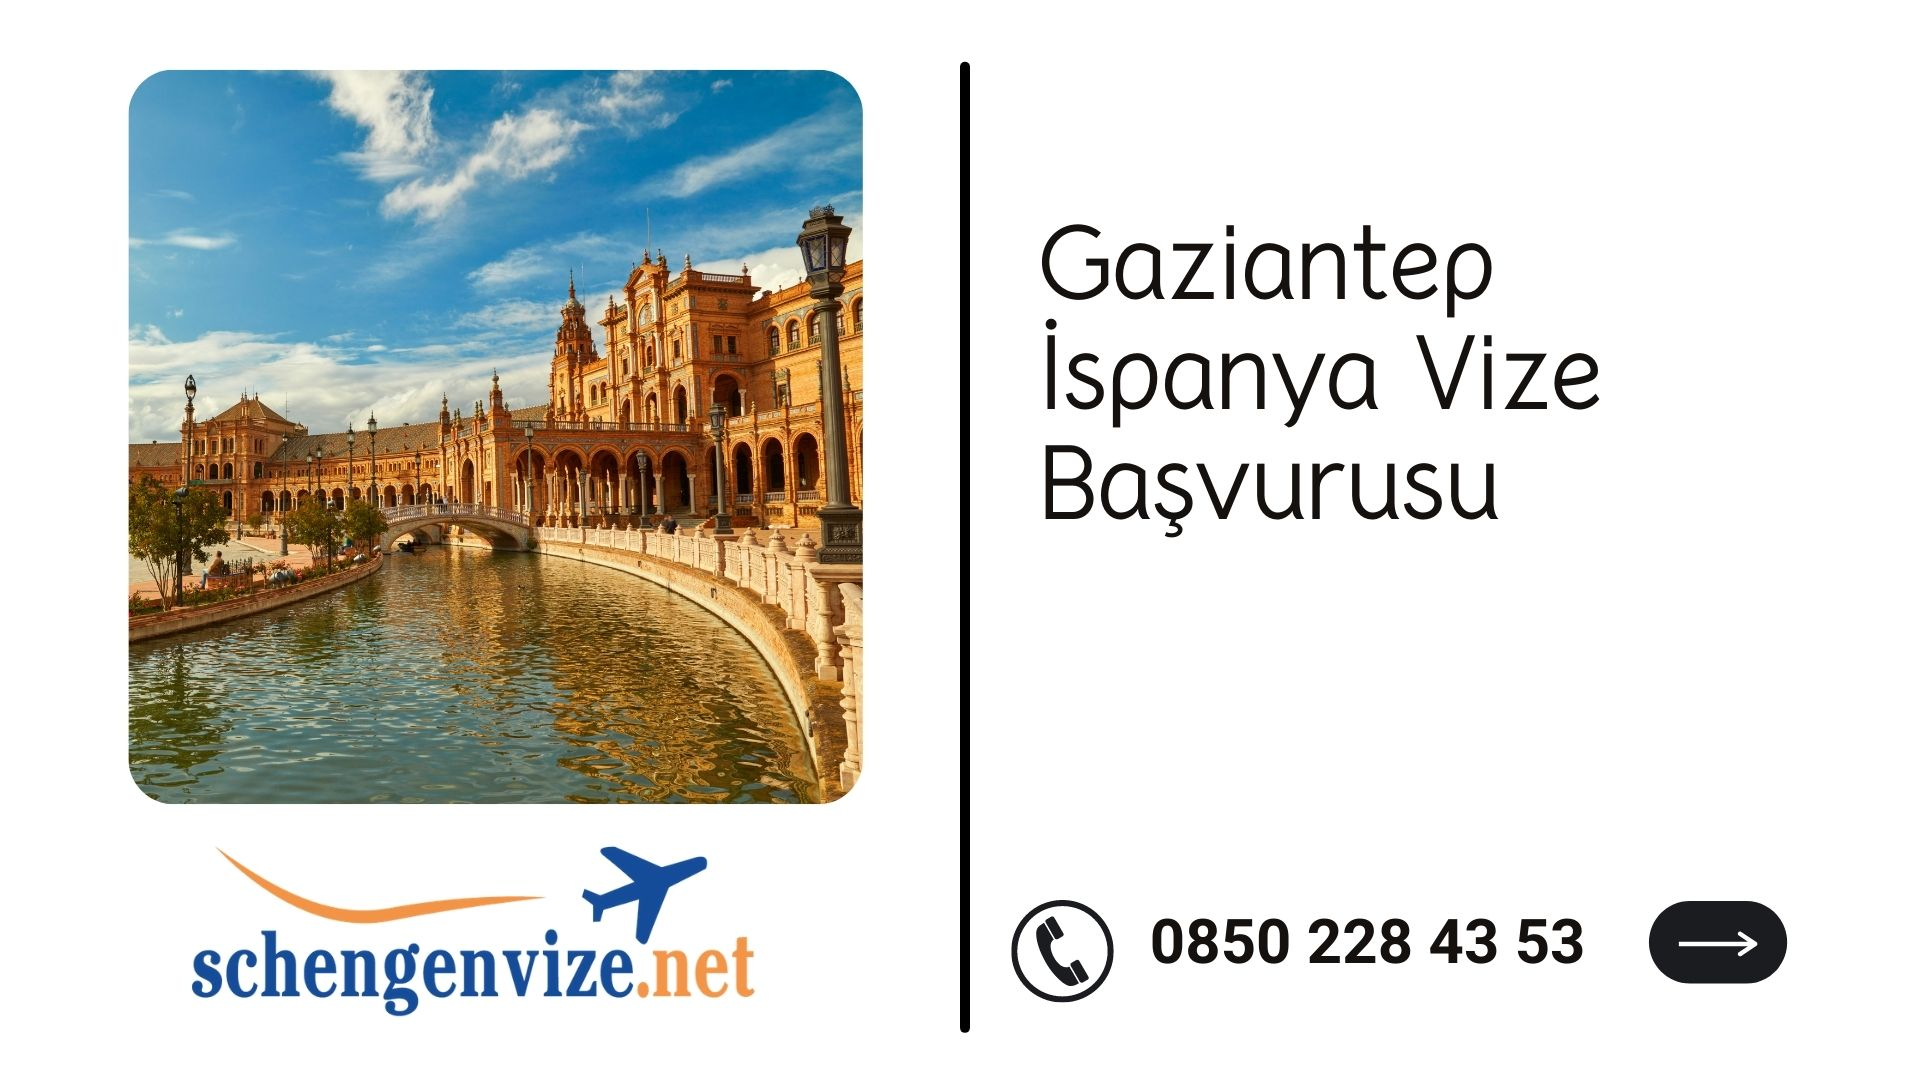 Gaziantep İspanya Vize Başvurusu